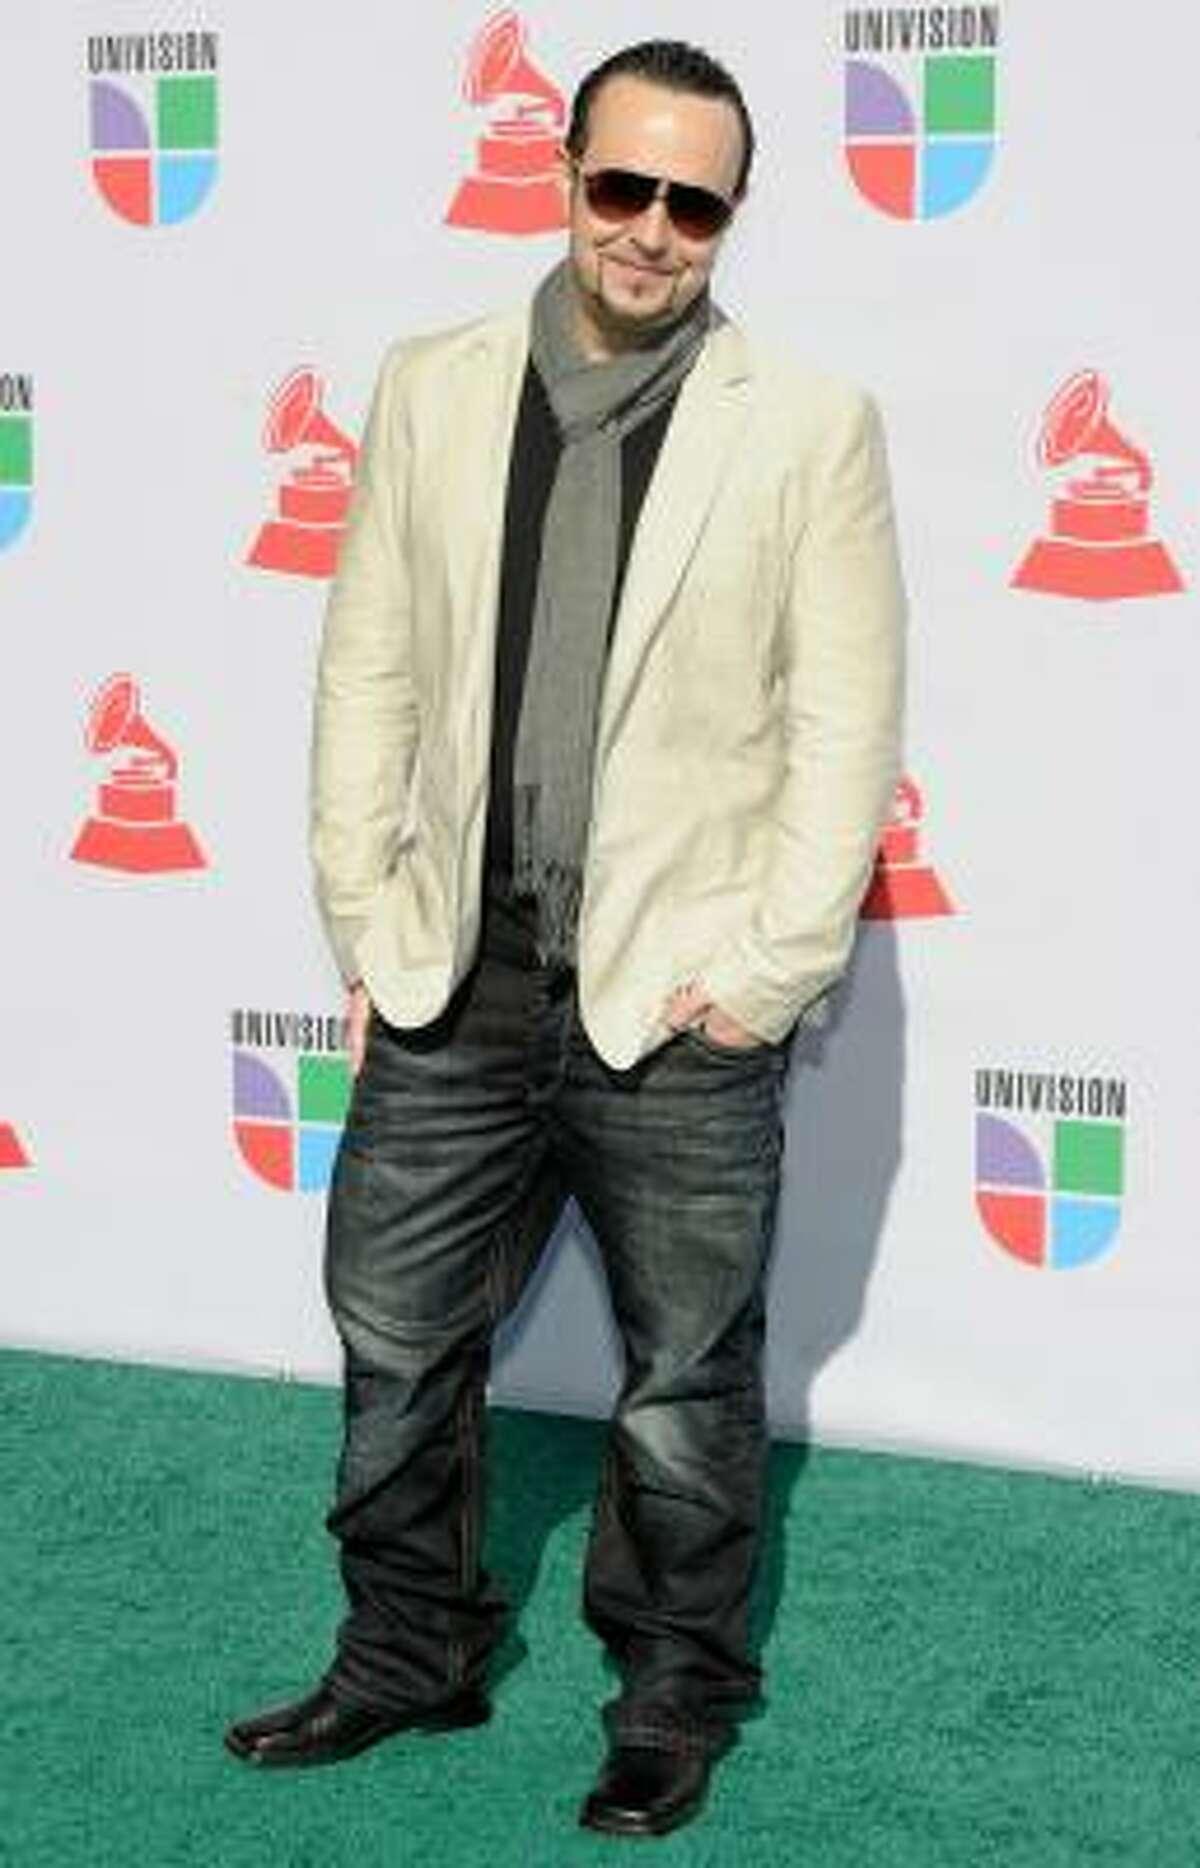 Musician Noel Pastor